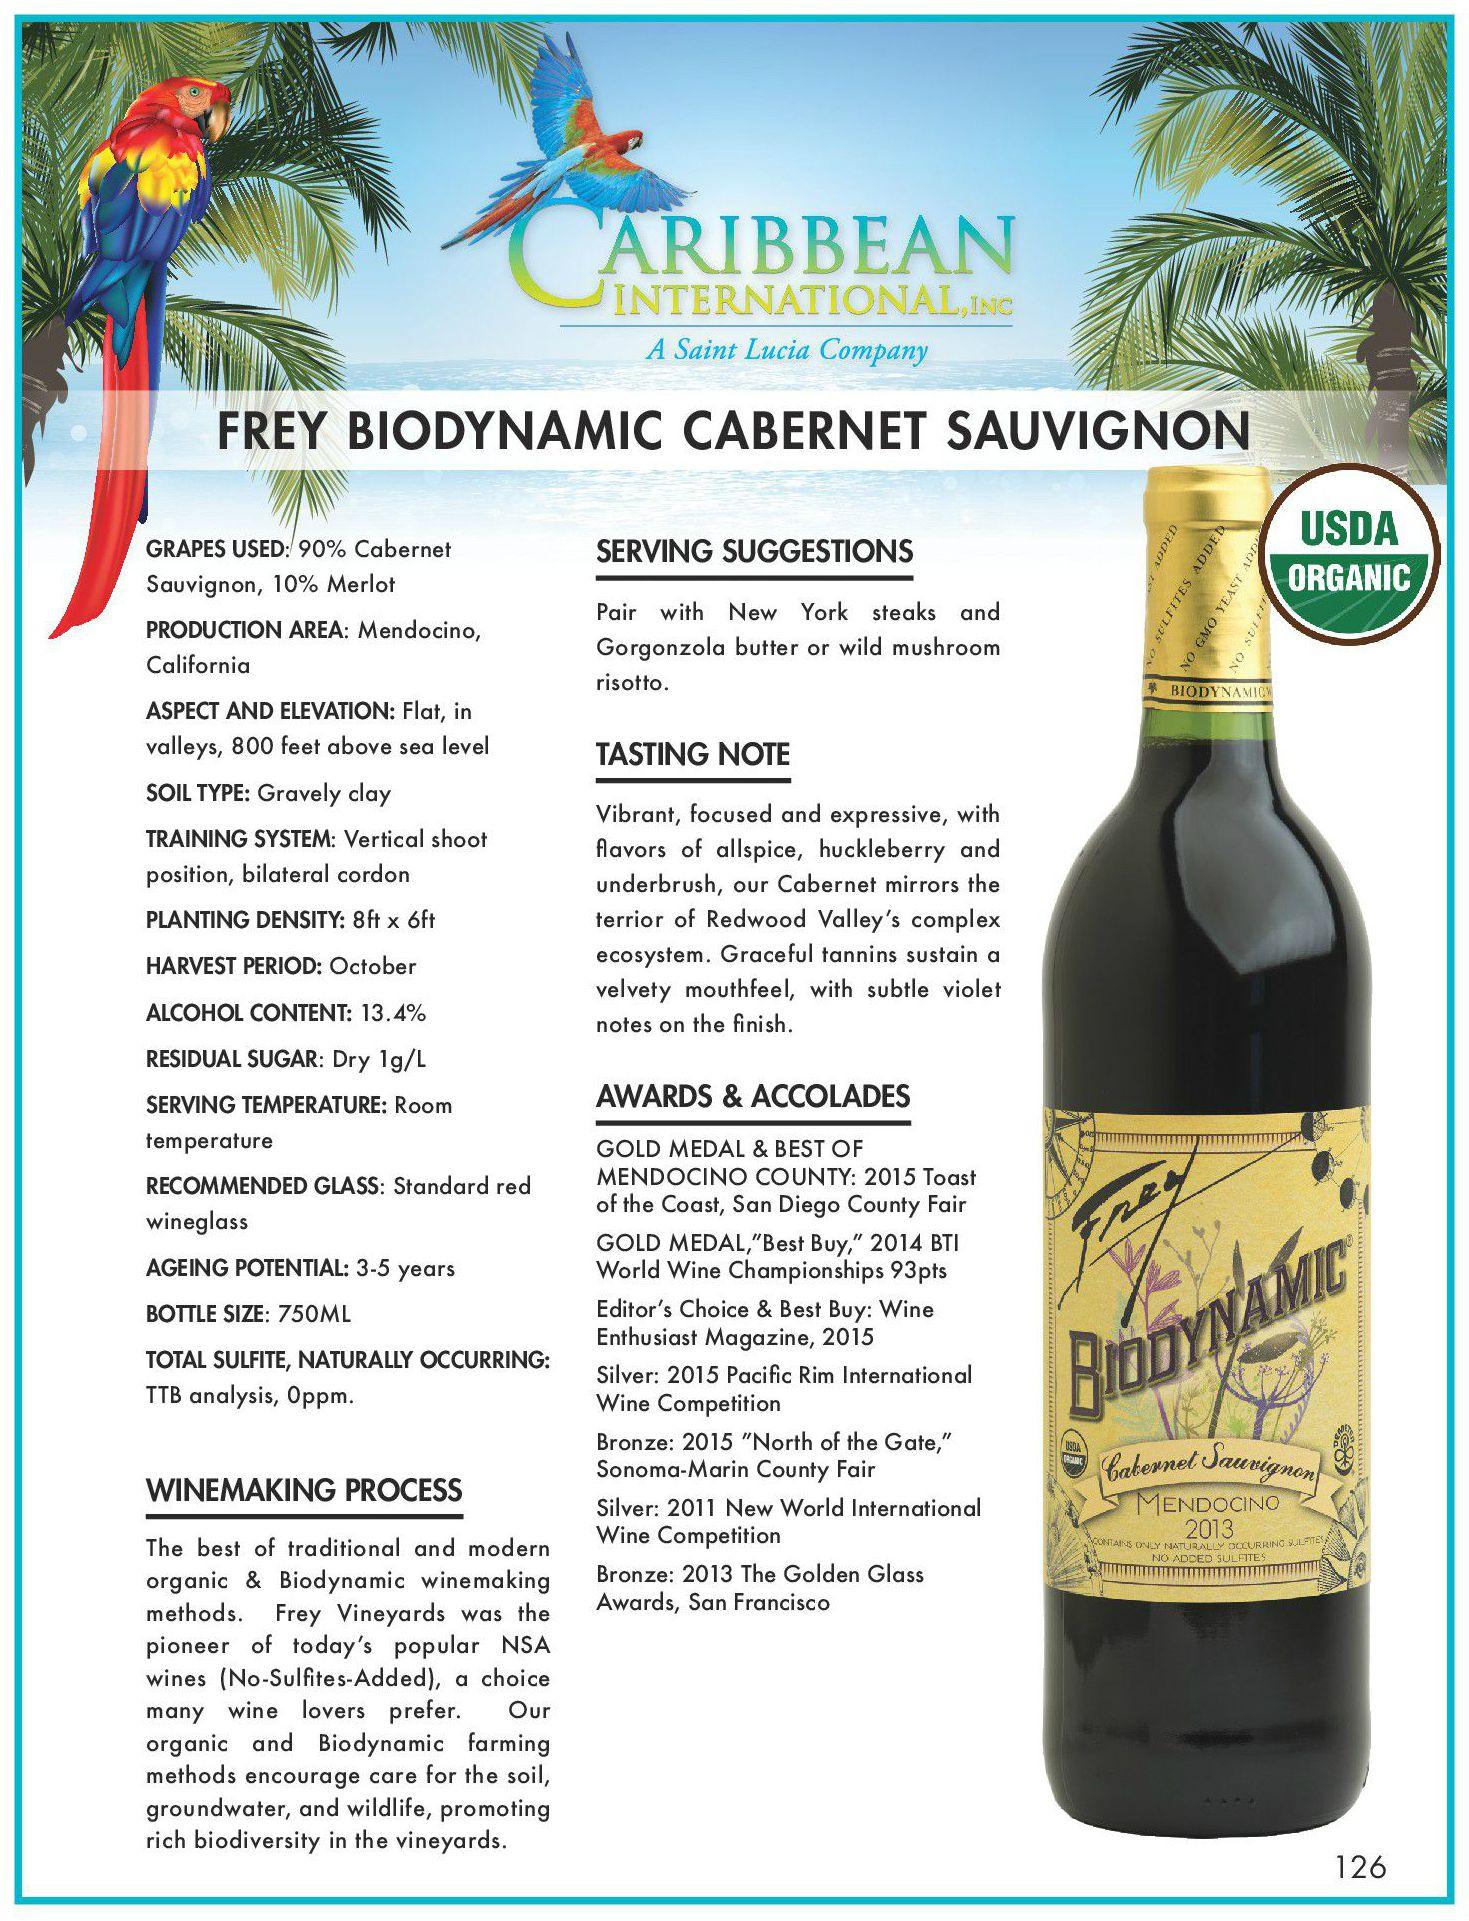 Biodynamic Cabernet Sauvignon - Caribbean International Inc